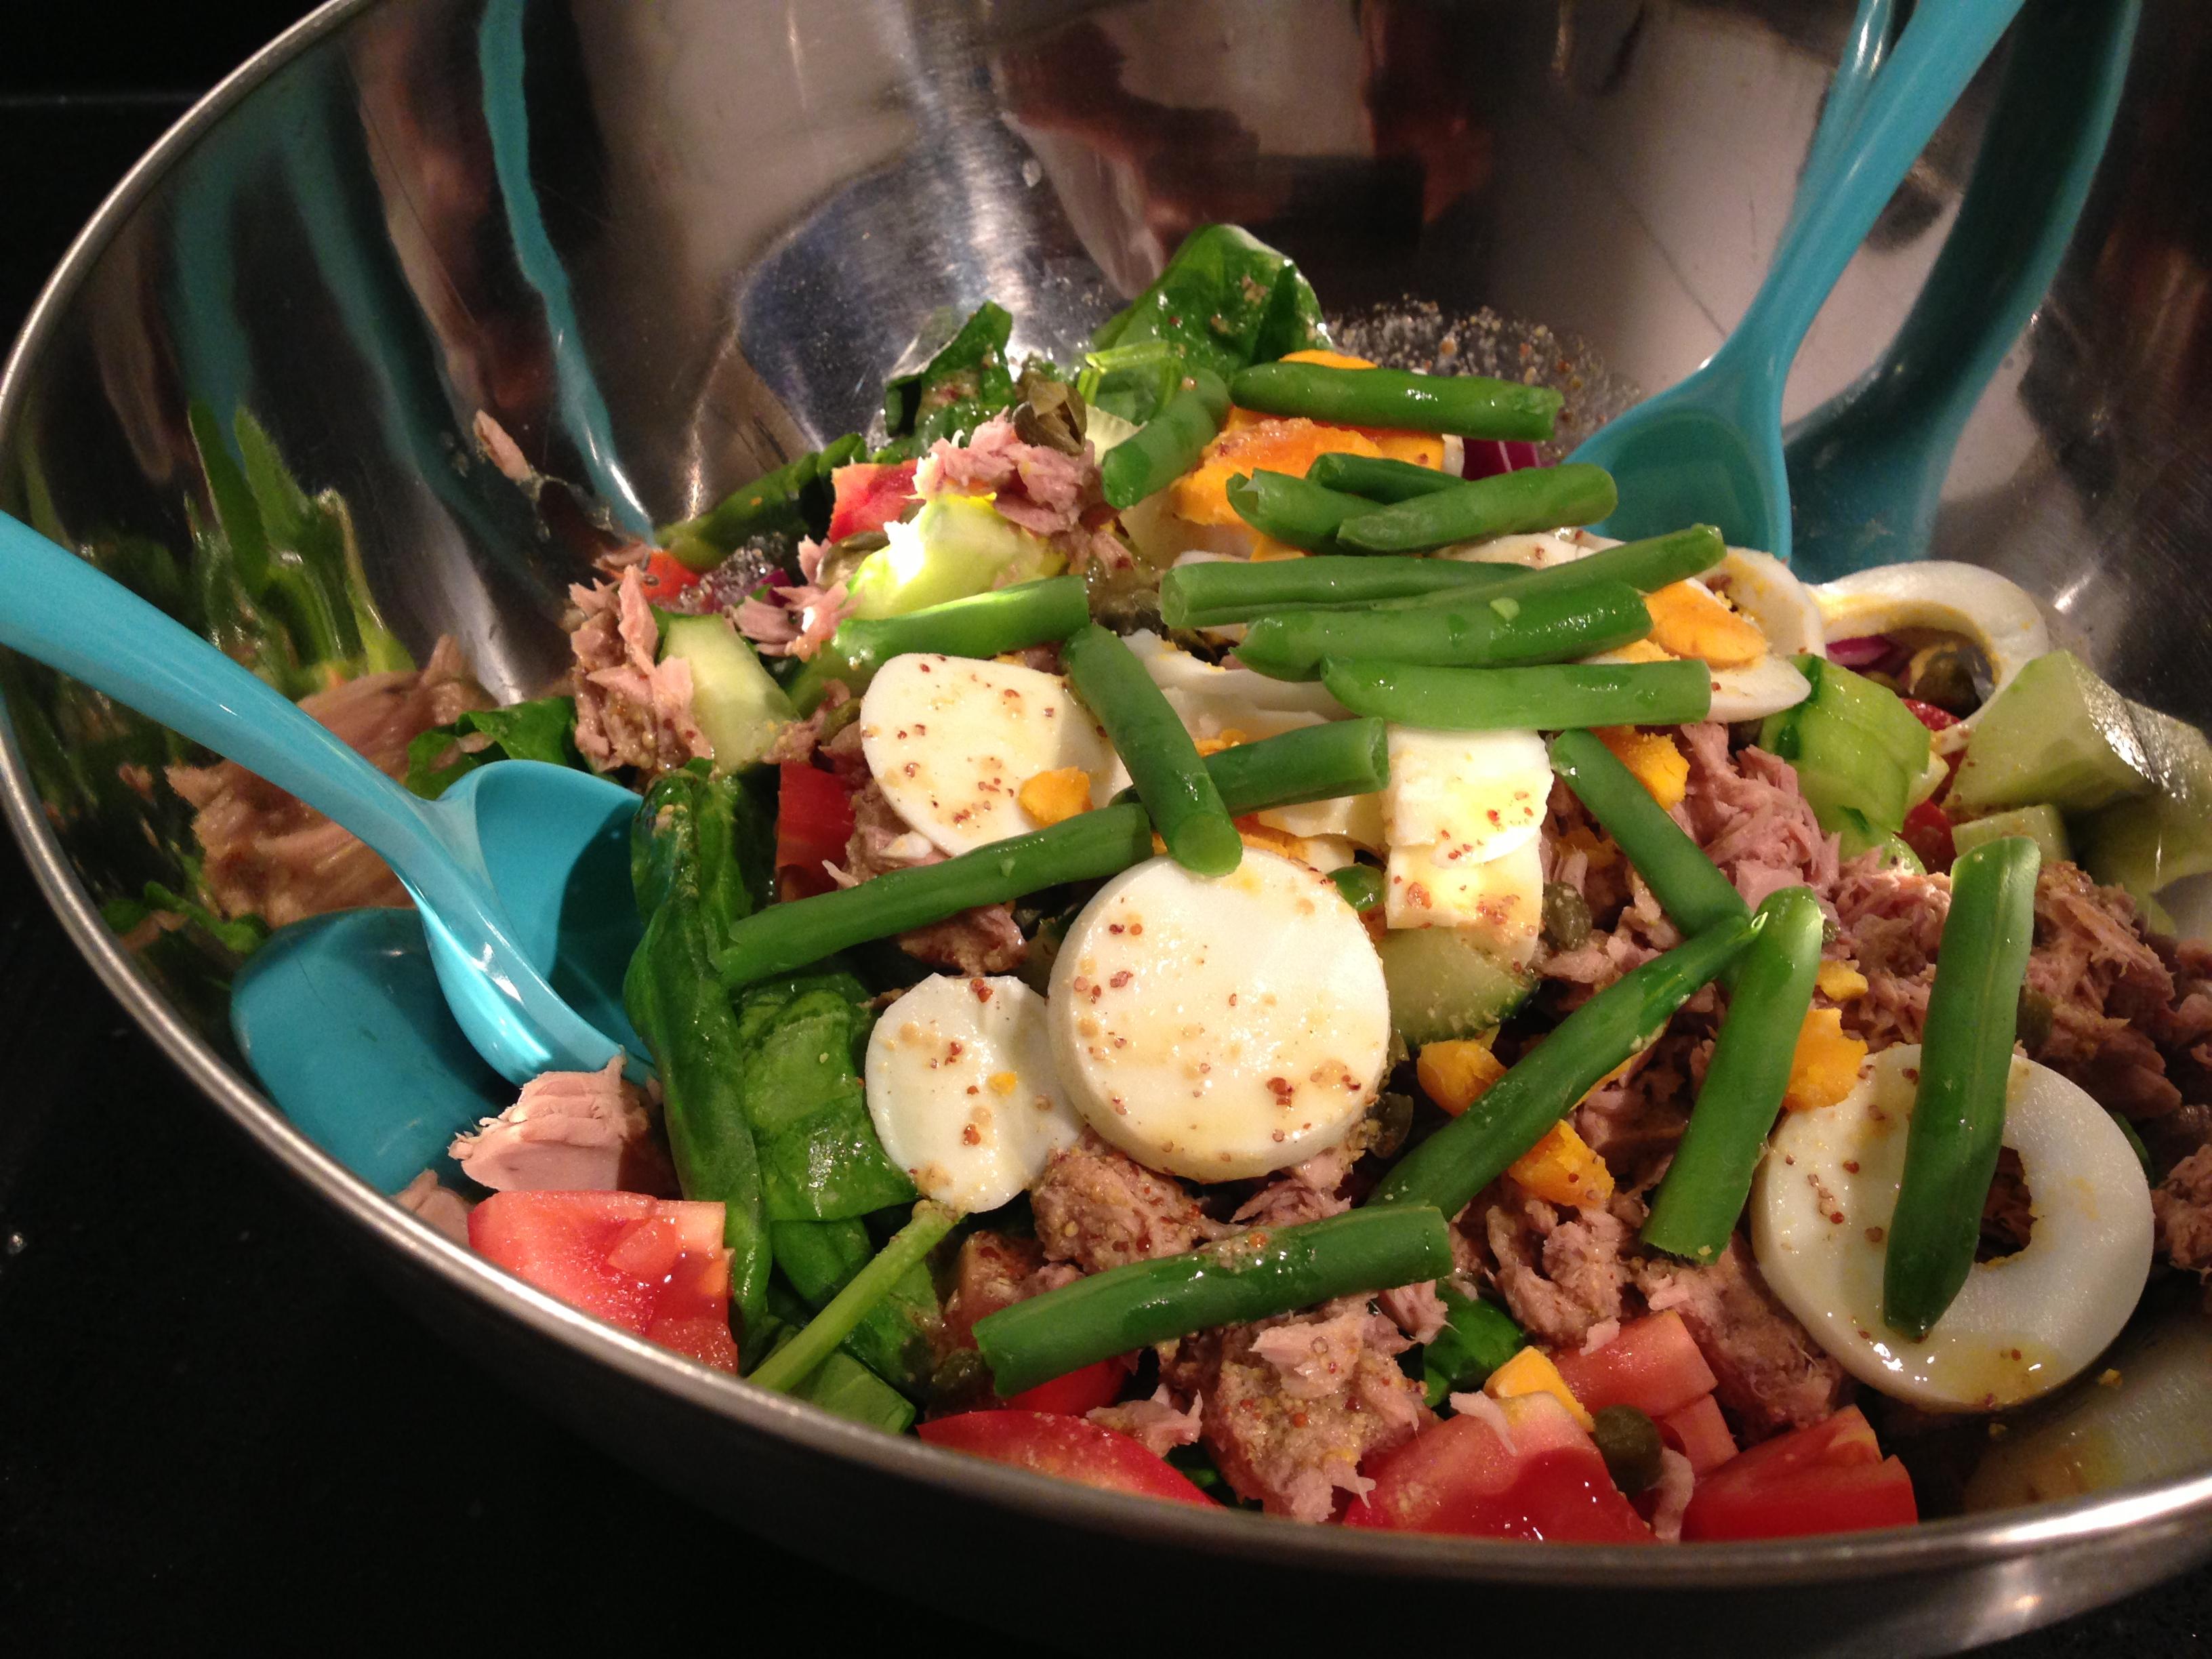 Eetdagboek salade